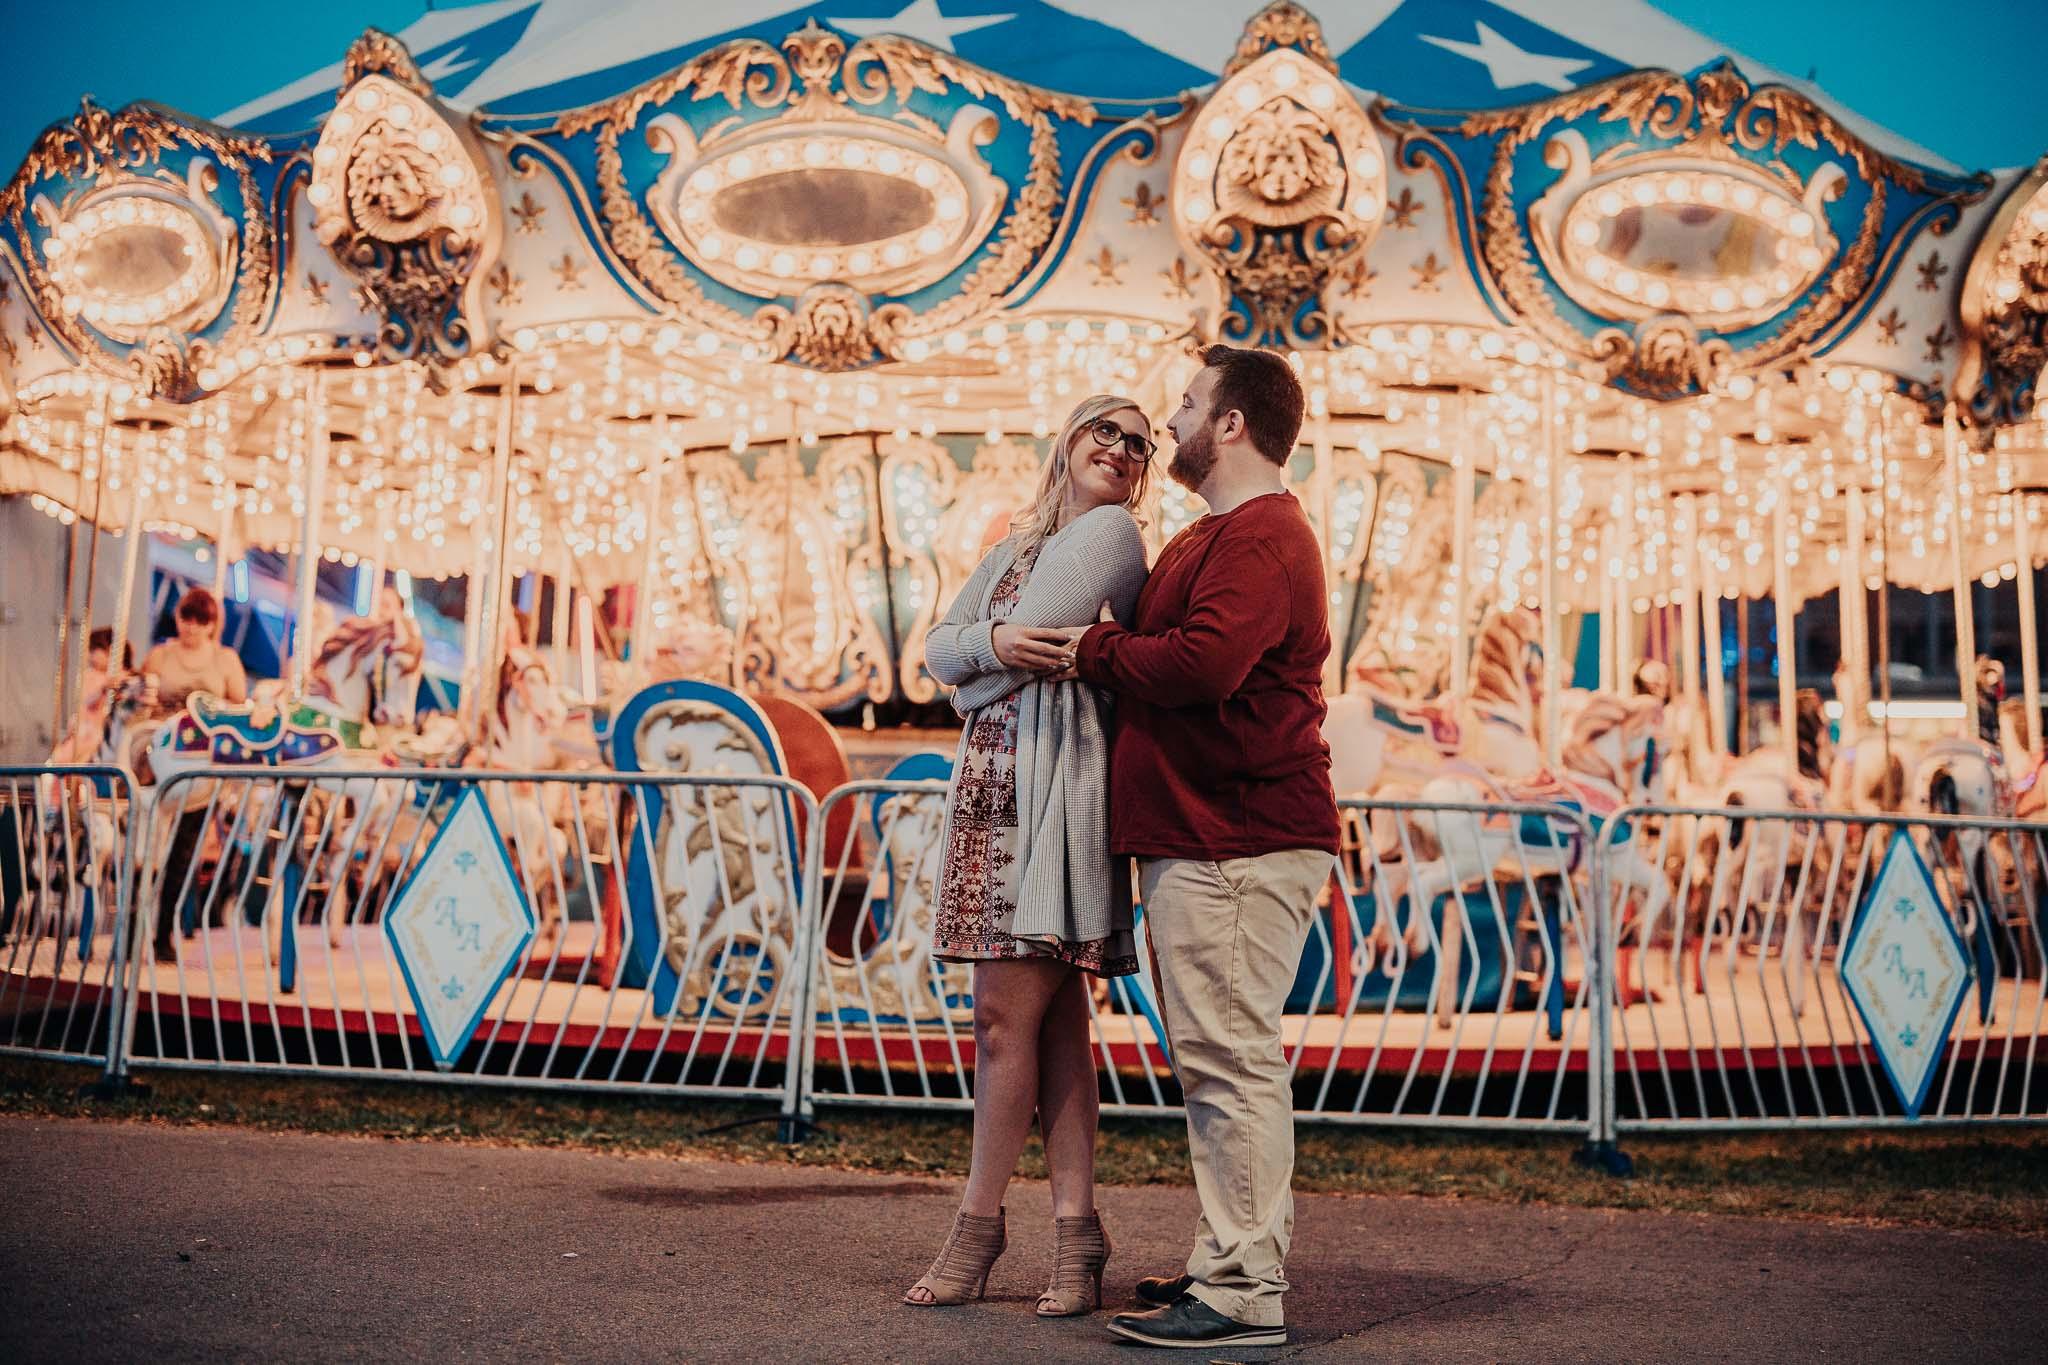 bloomsburg-fair-engagement-5521.jpg